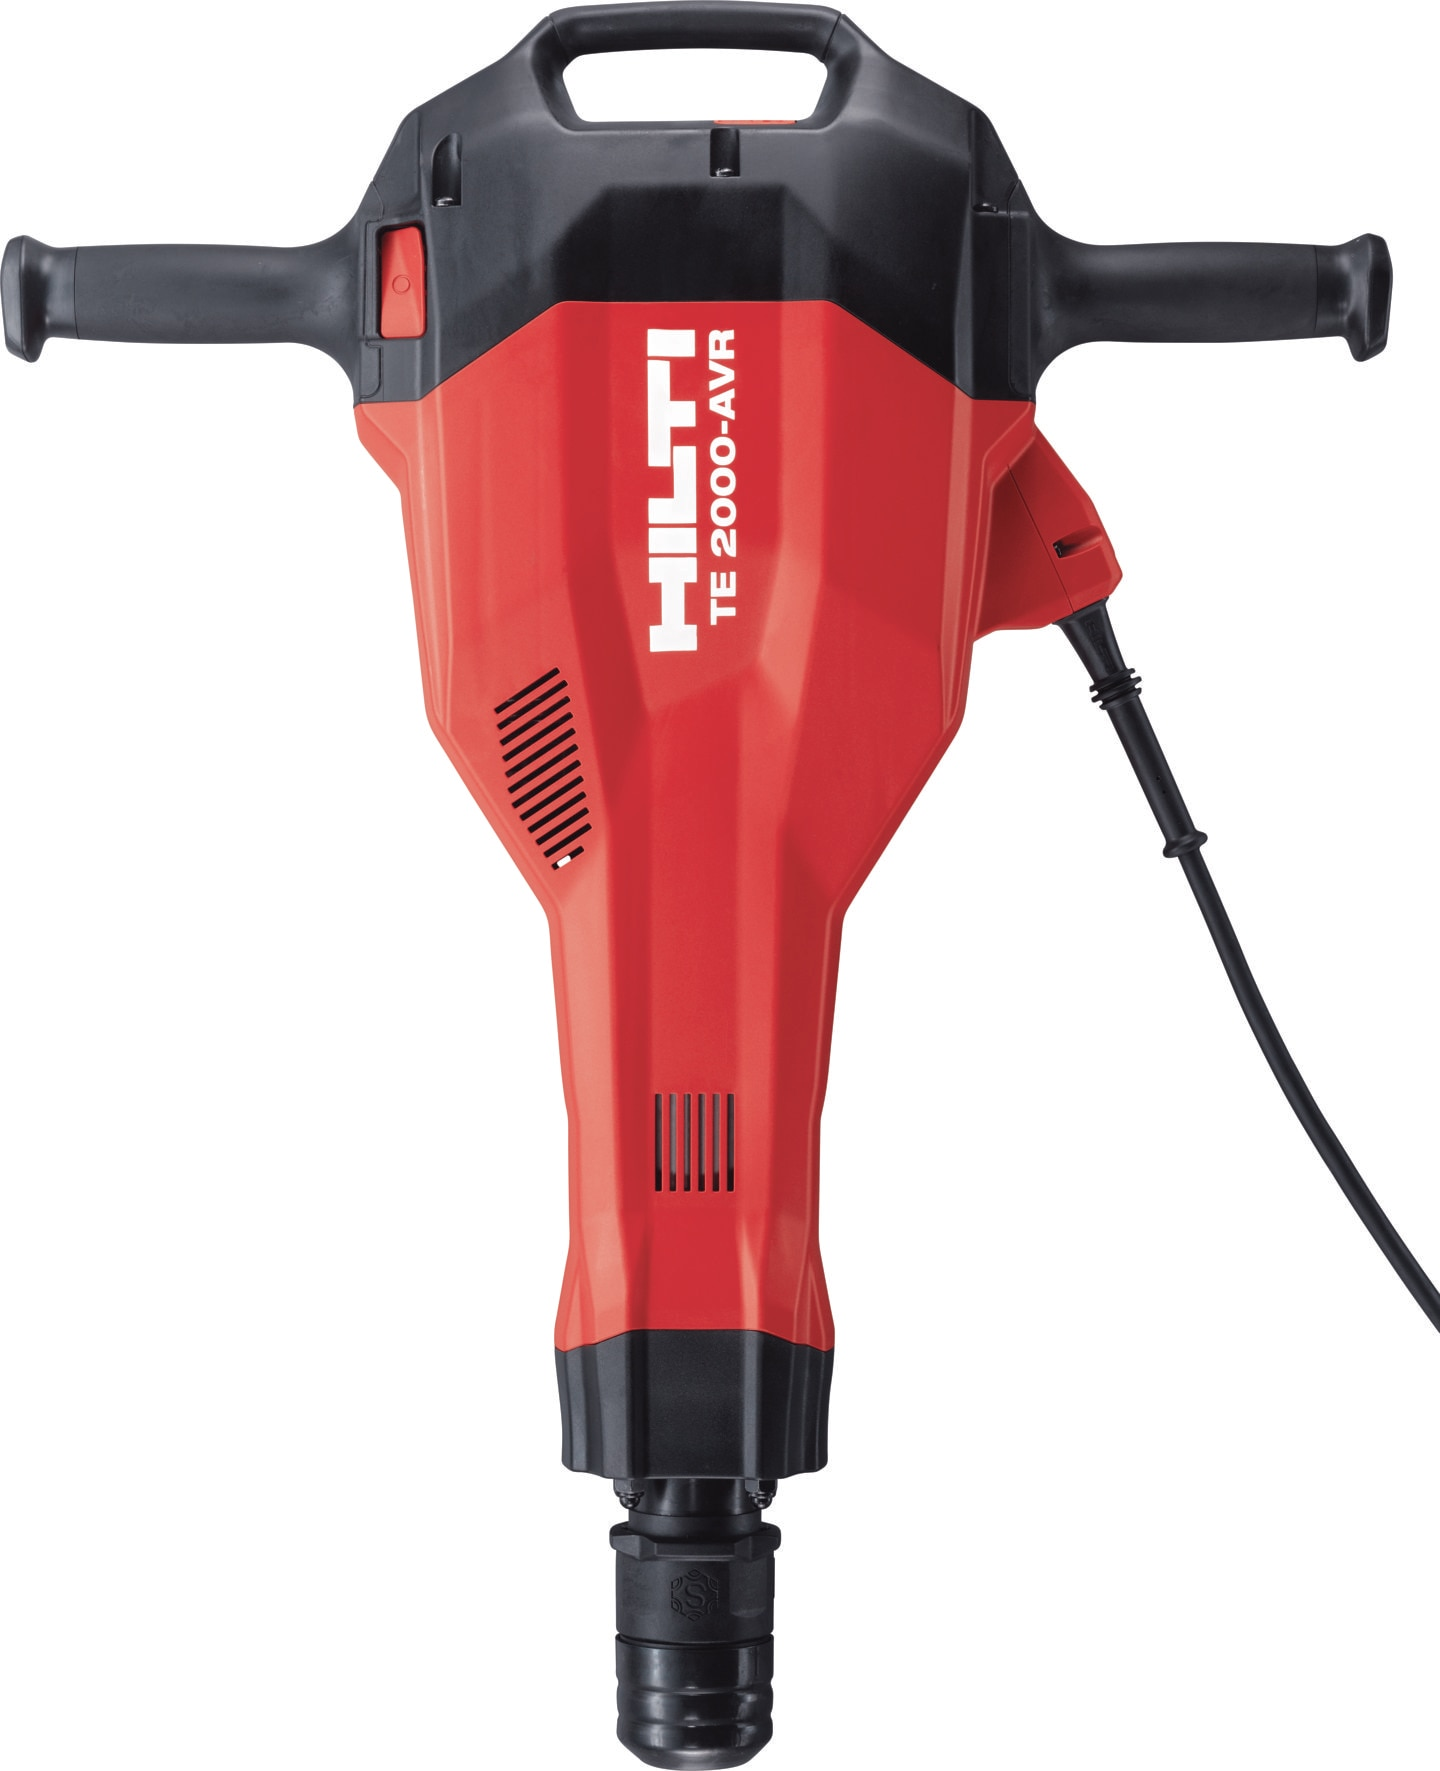 Hilti TE 2000-AVR Floor Breaker